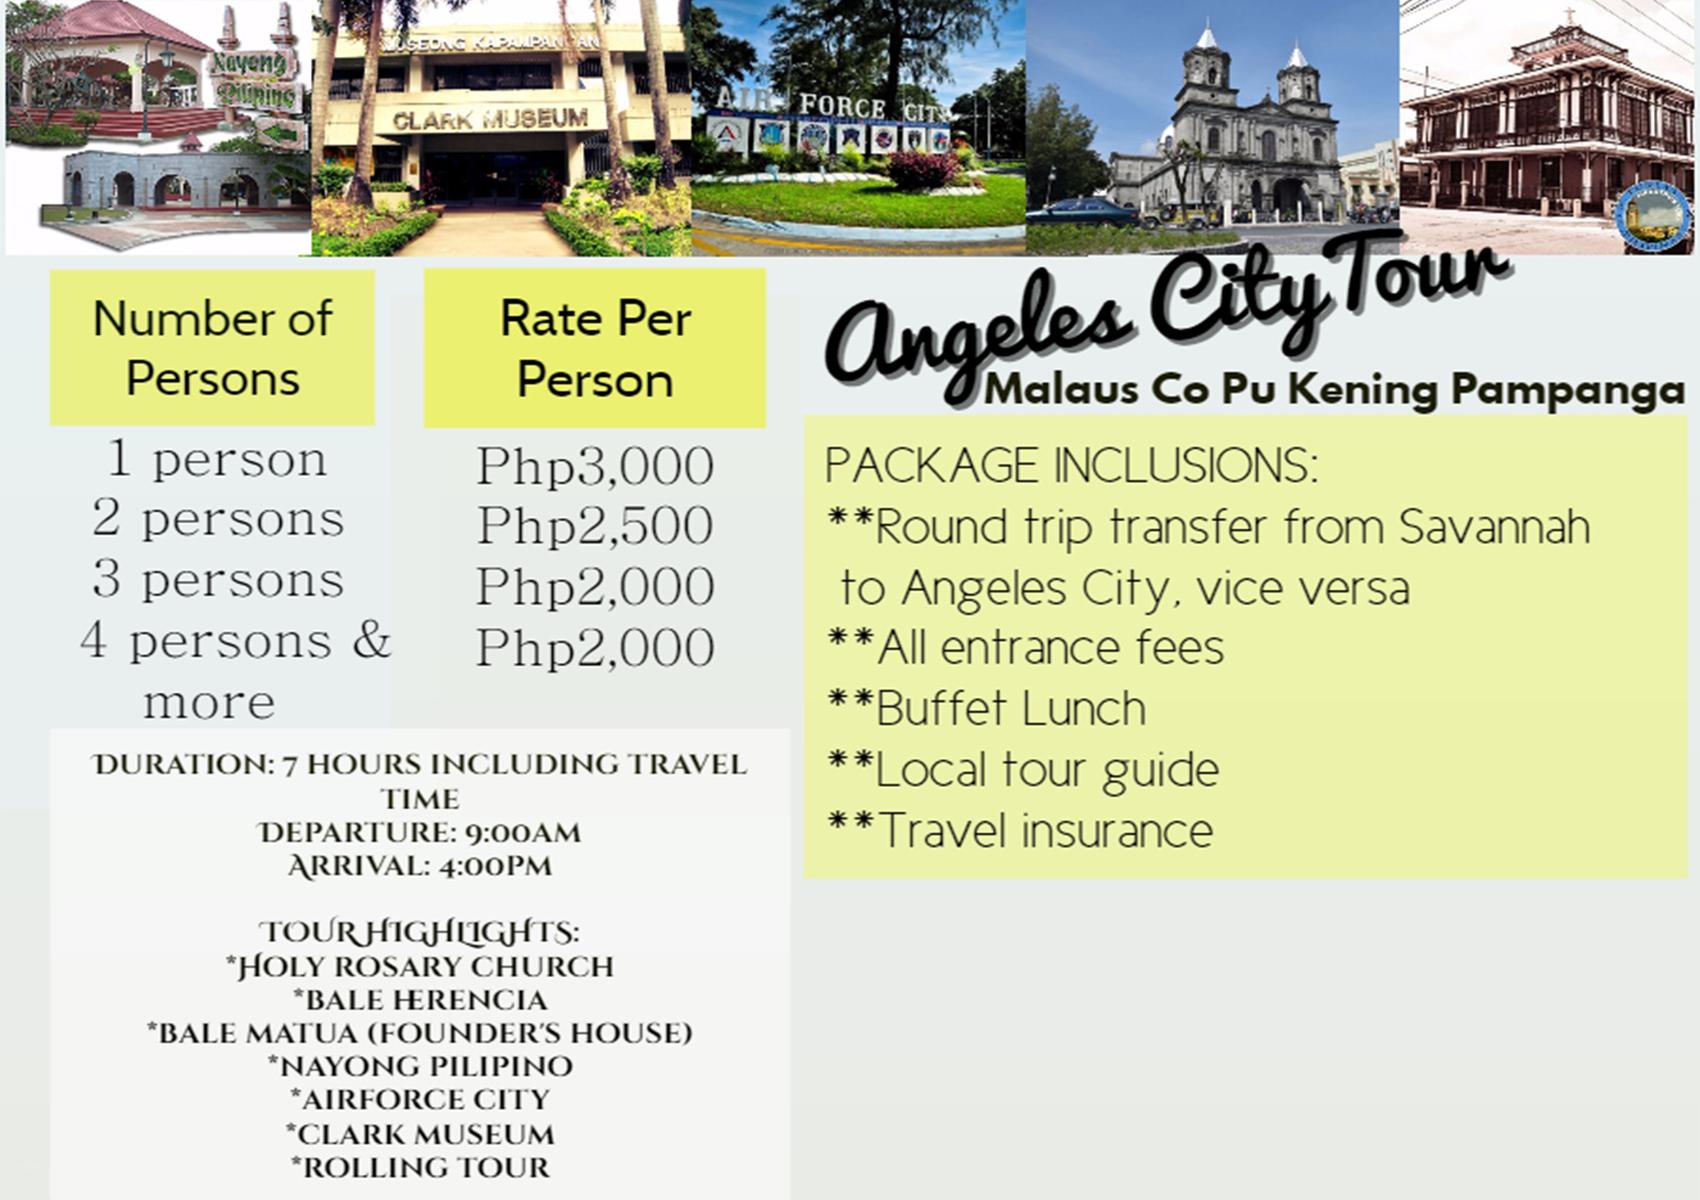 Angeles City Tour